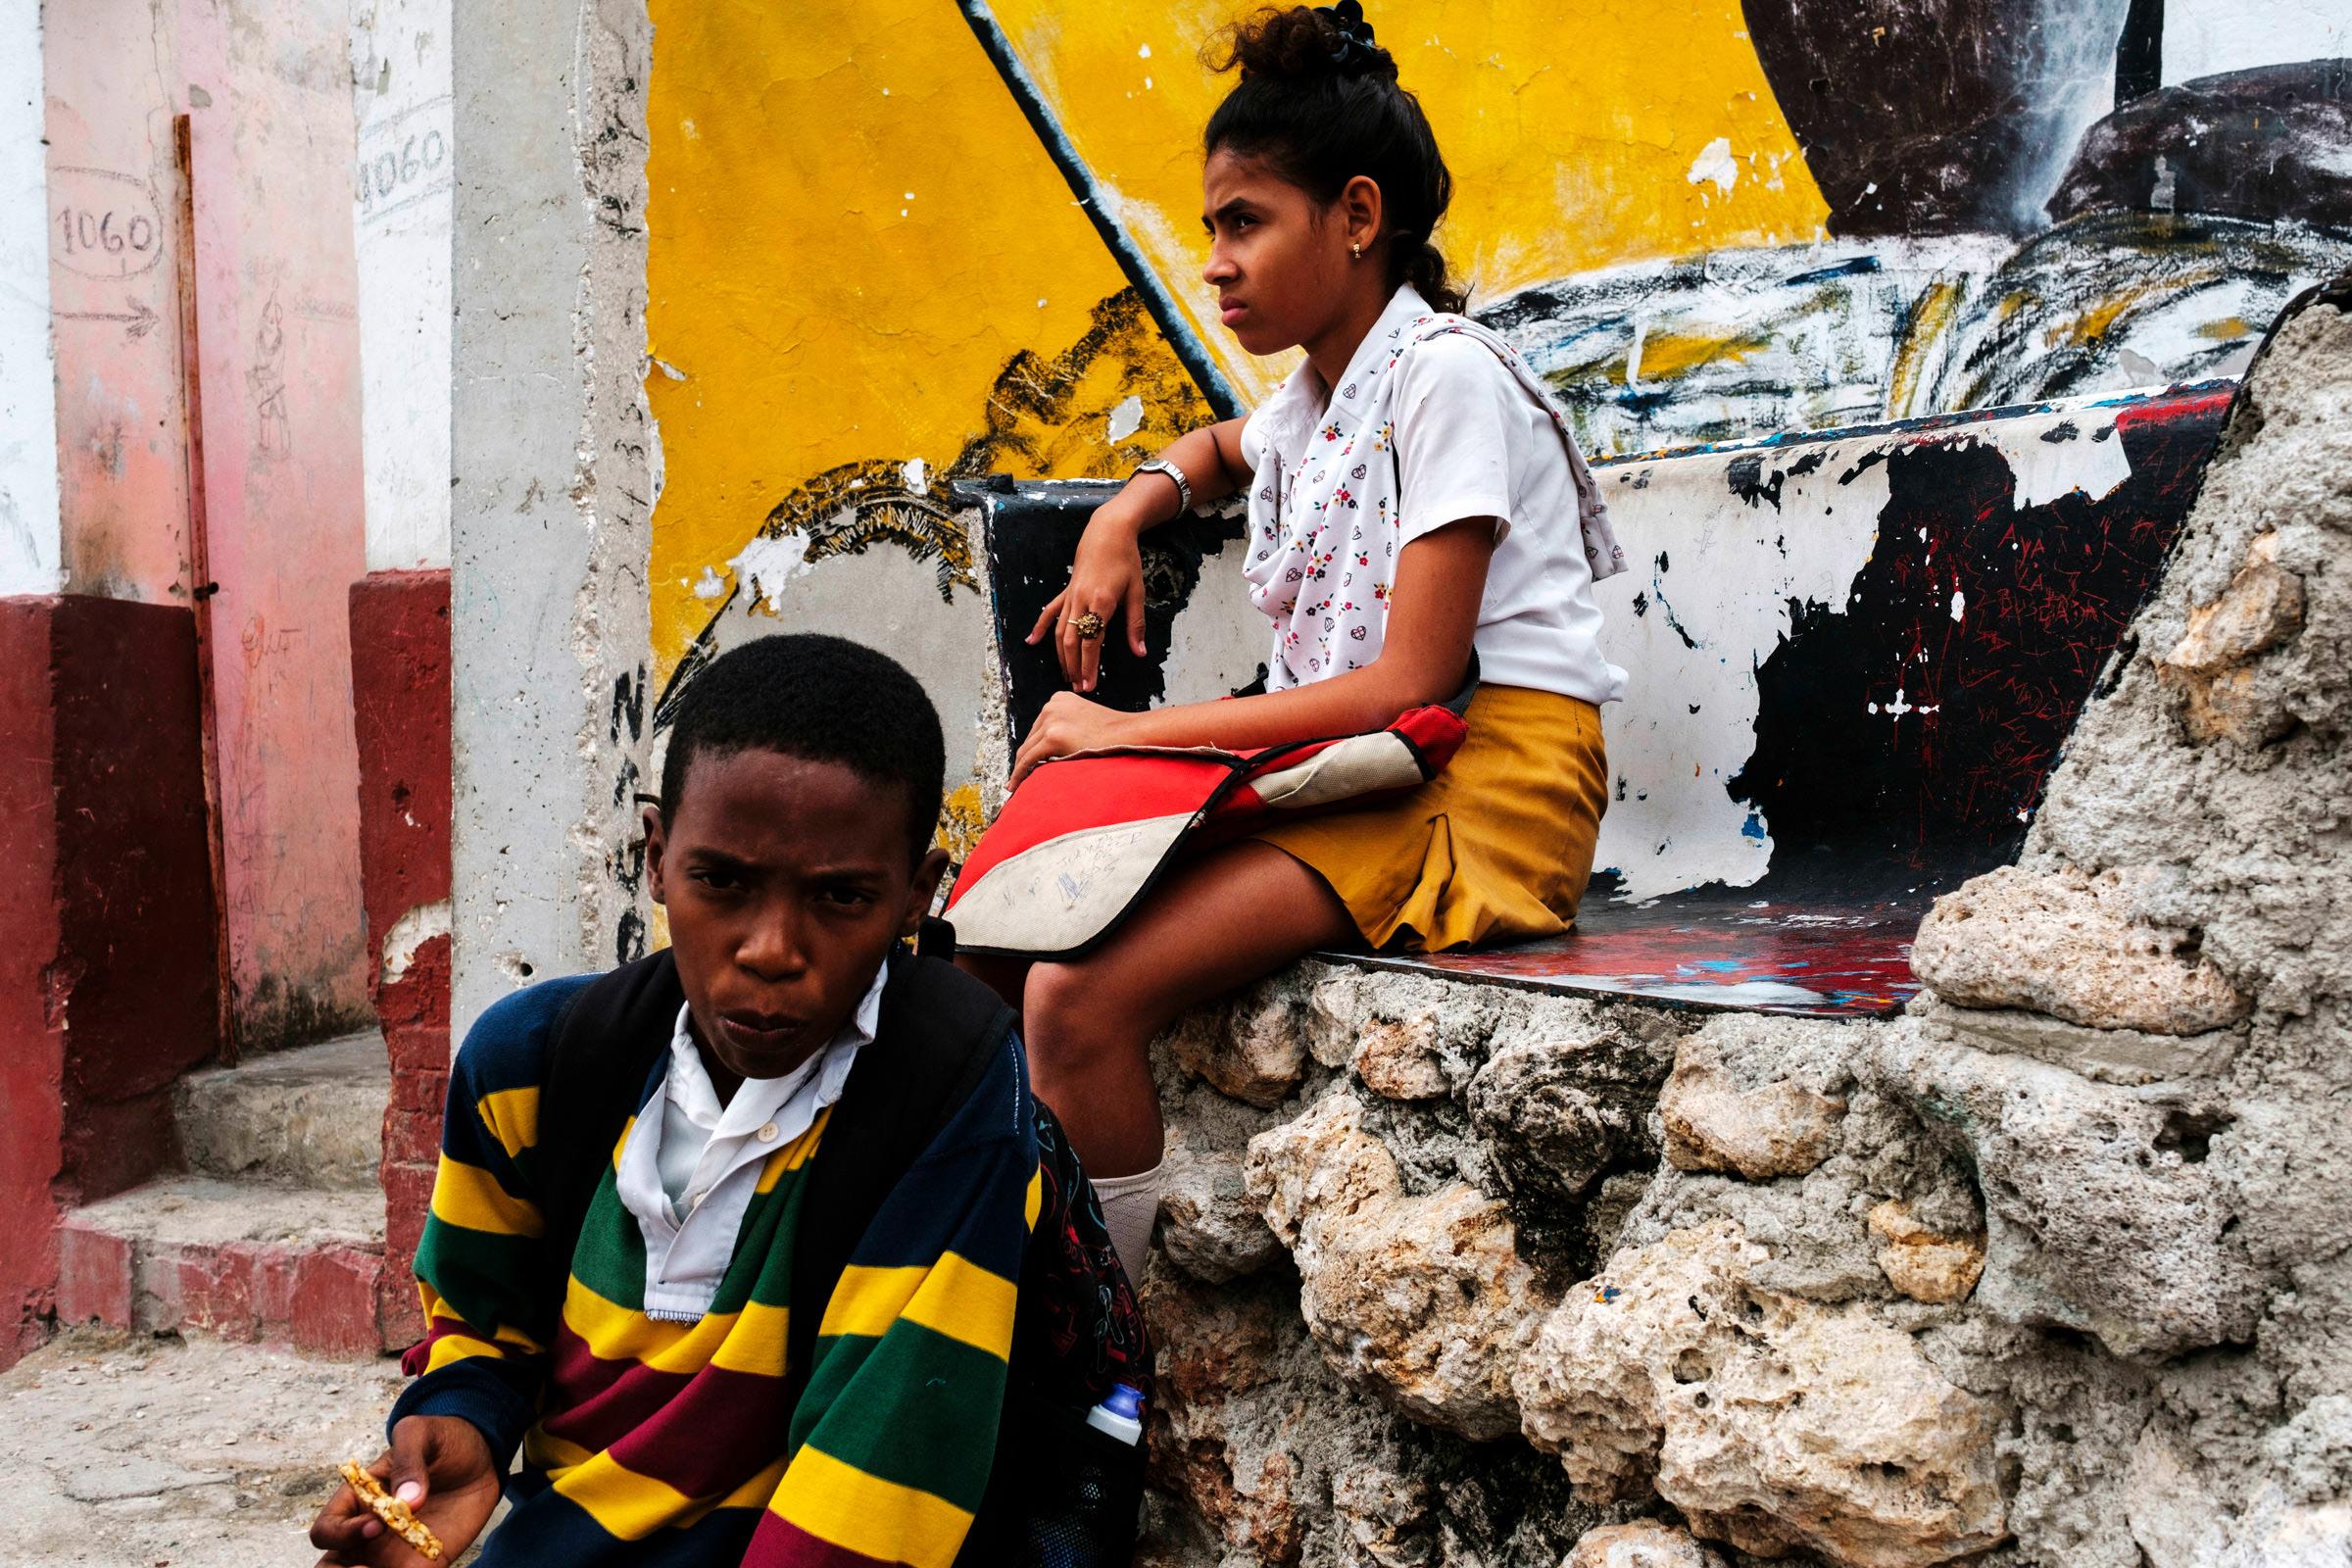 Cuba-Street-Photography-6